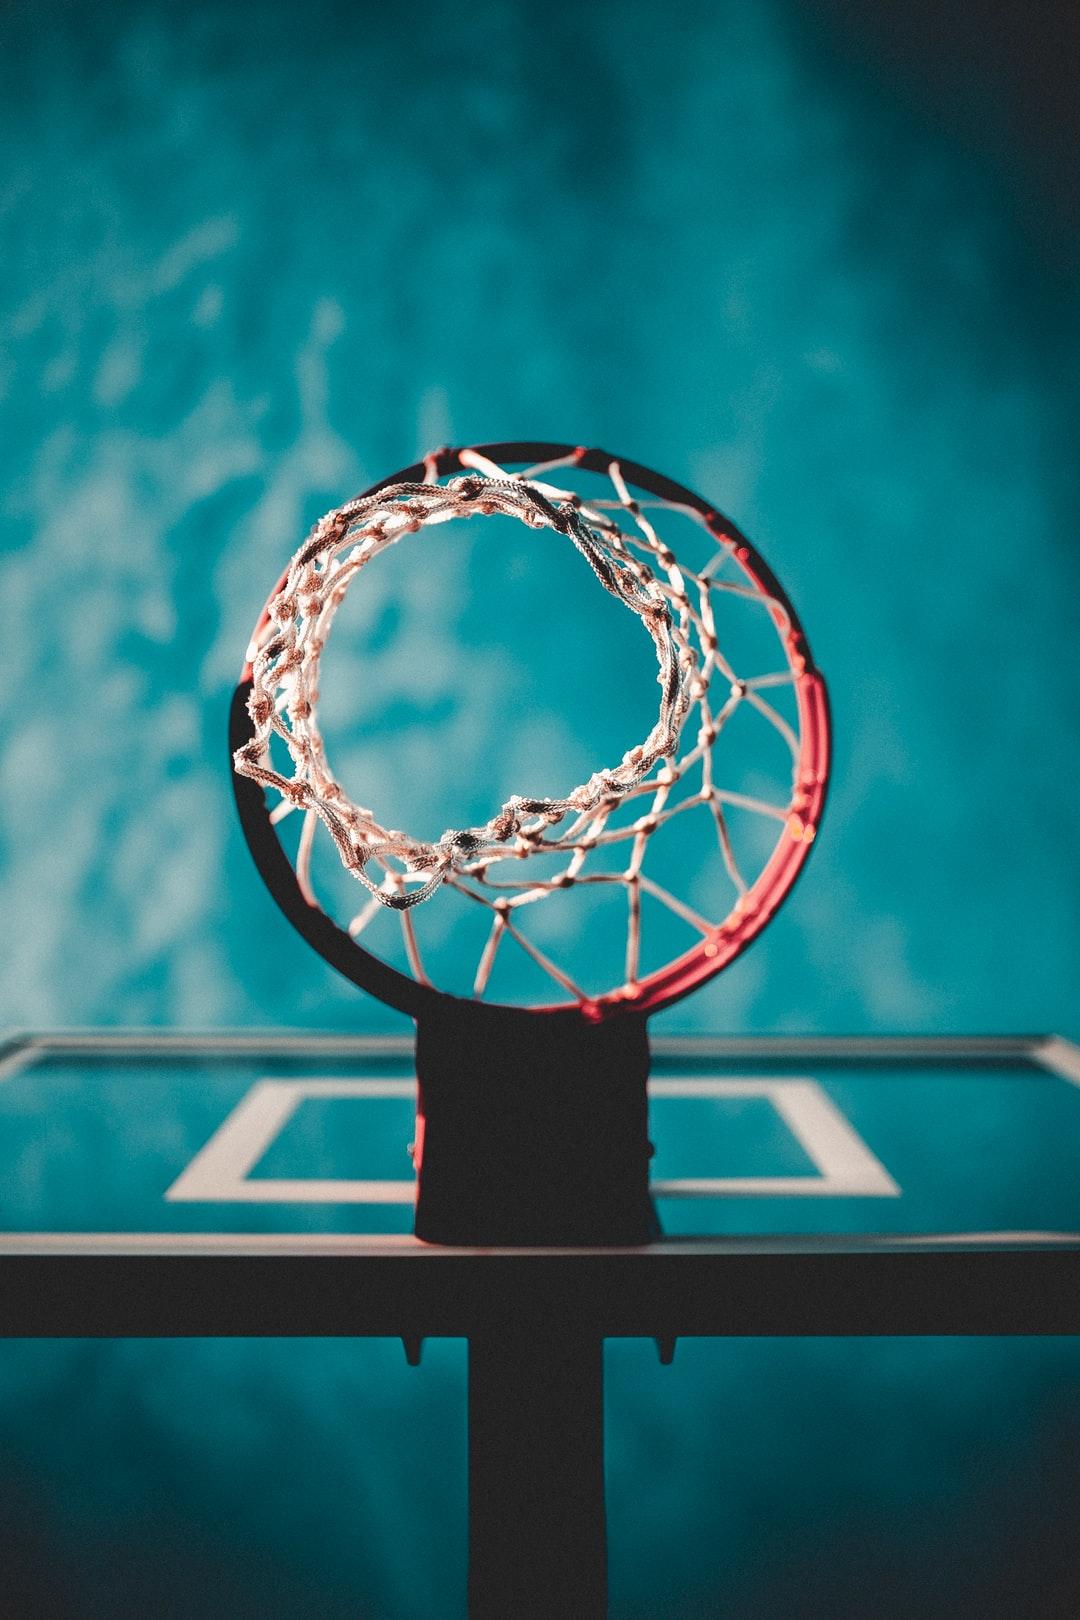 Basketball Wallpapers HD Download [500 HQ] Unsplash 1080x1620